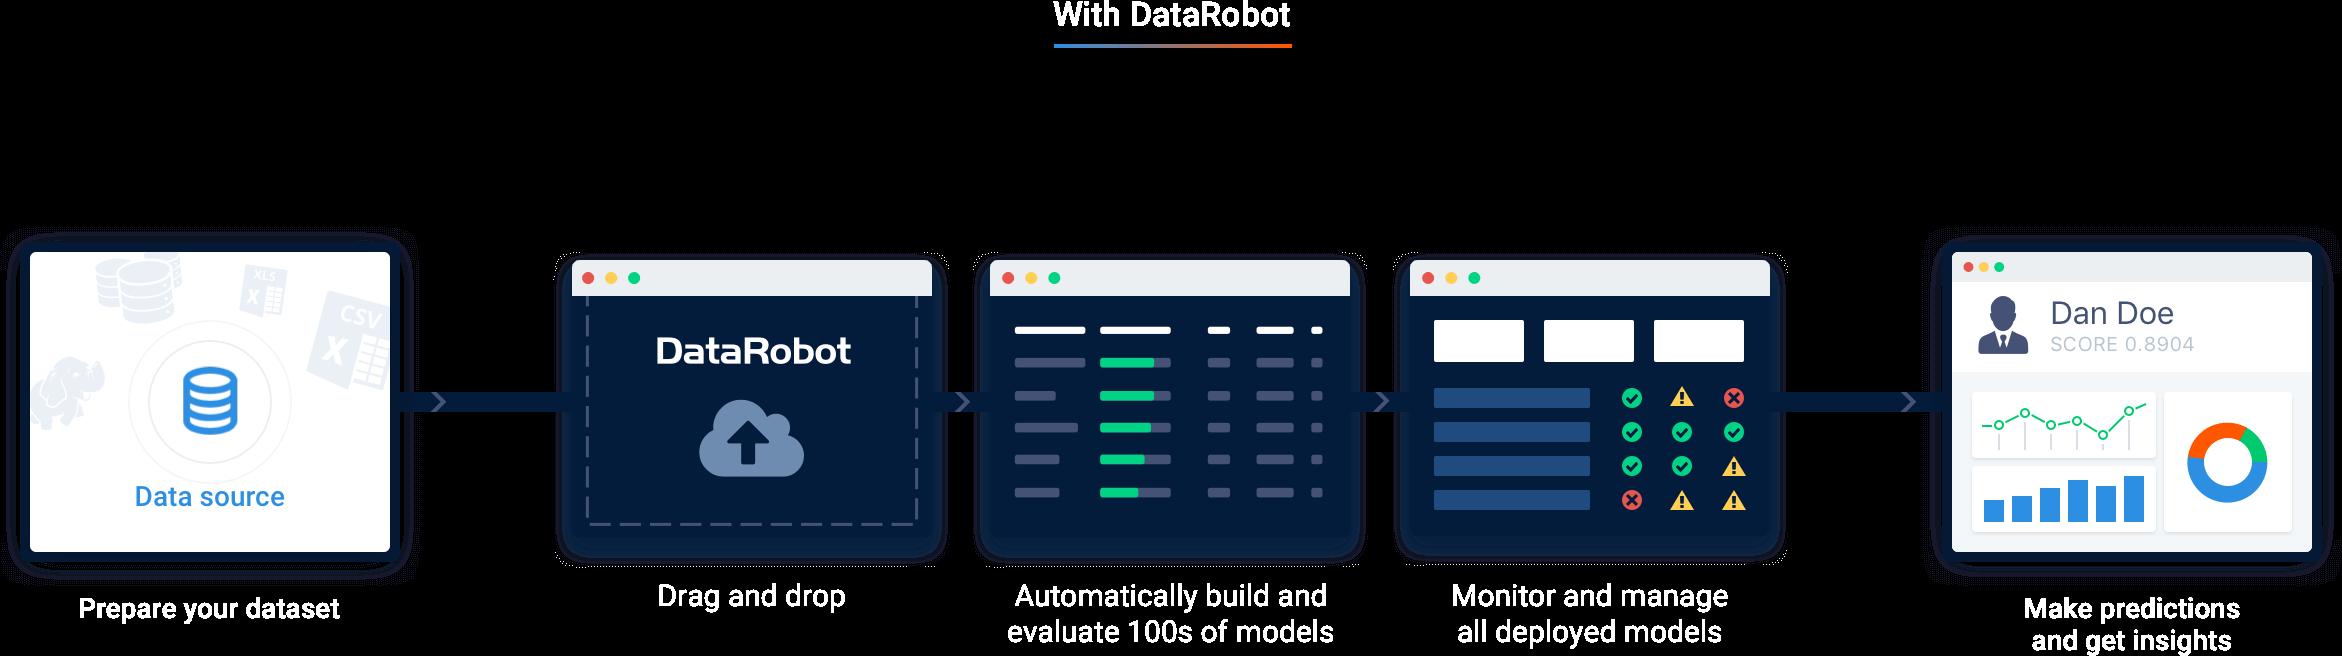 With DataRobot